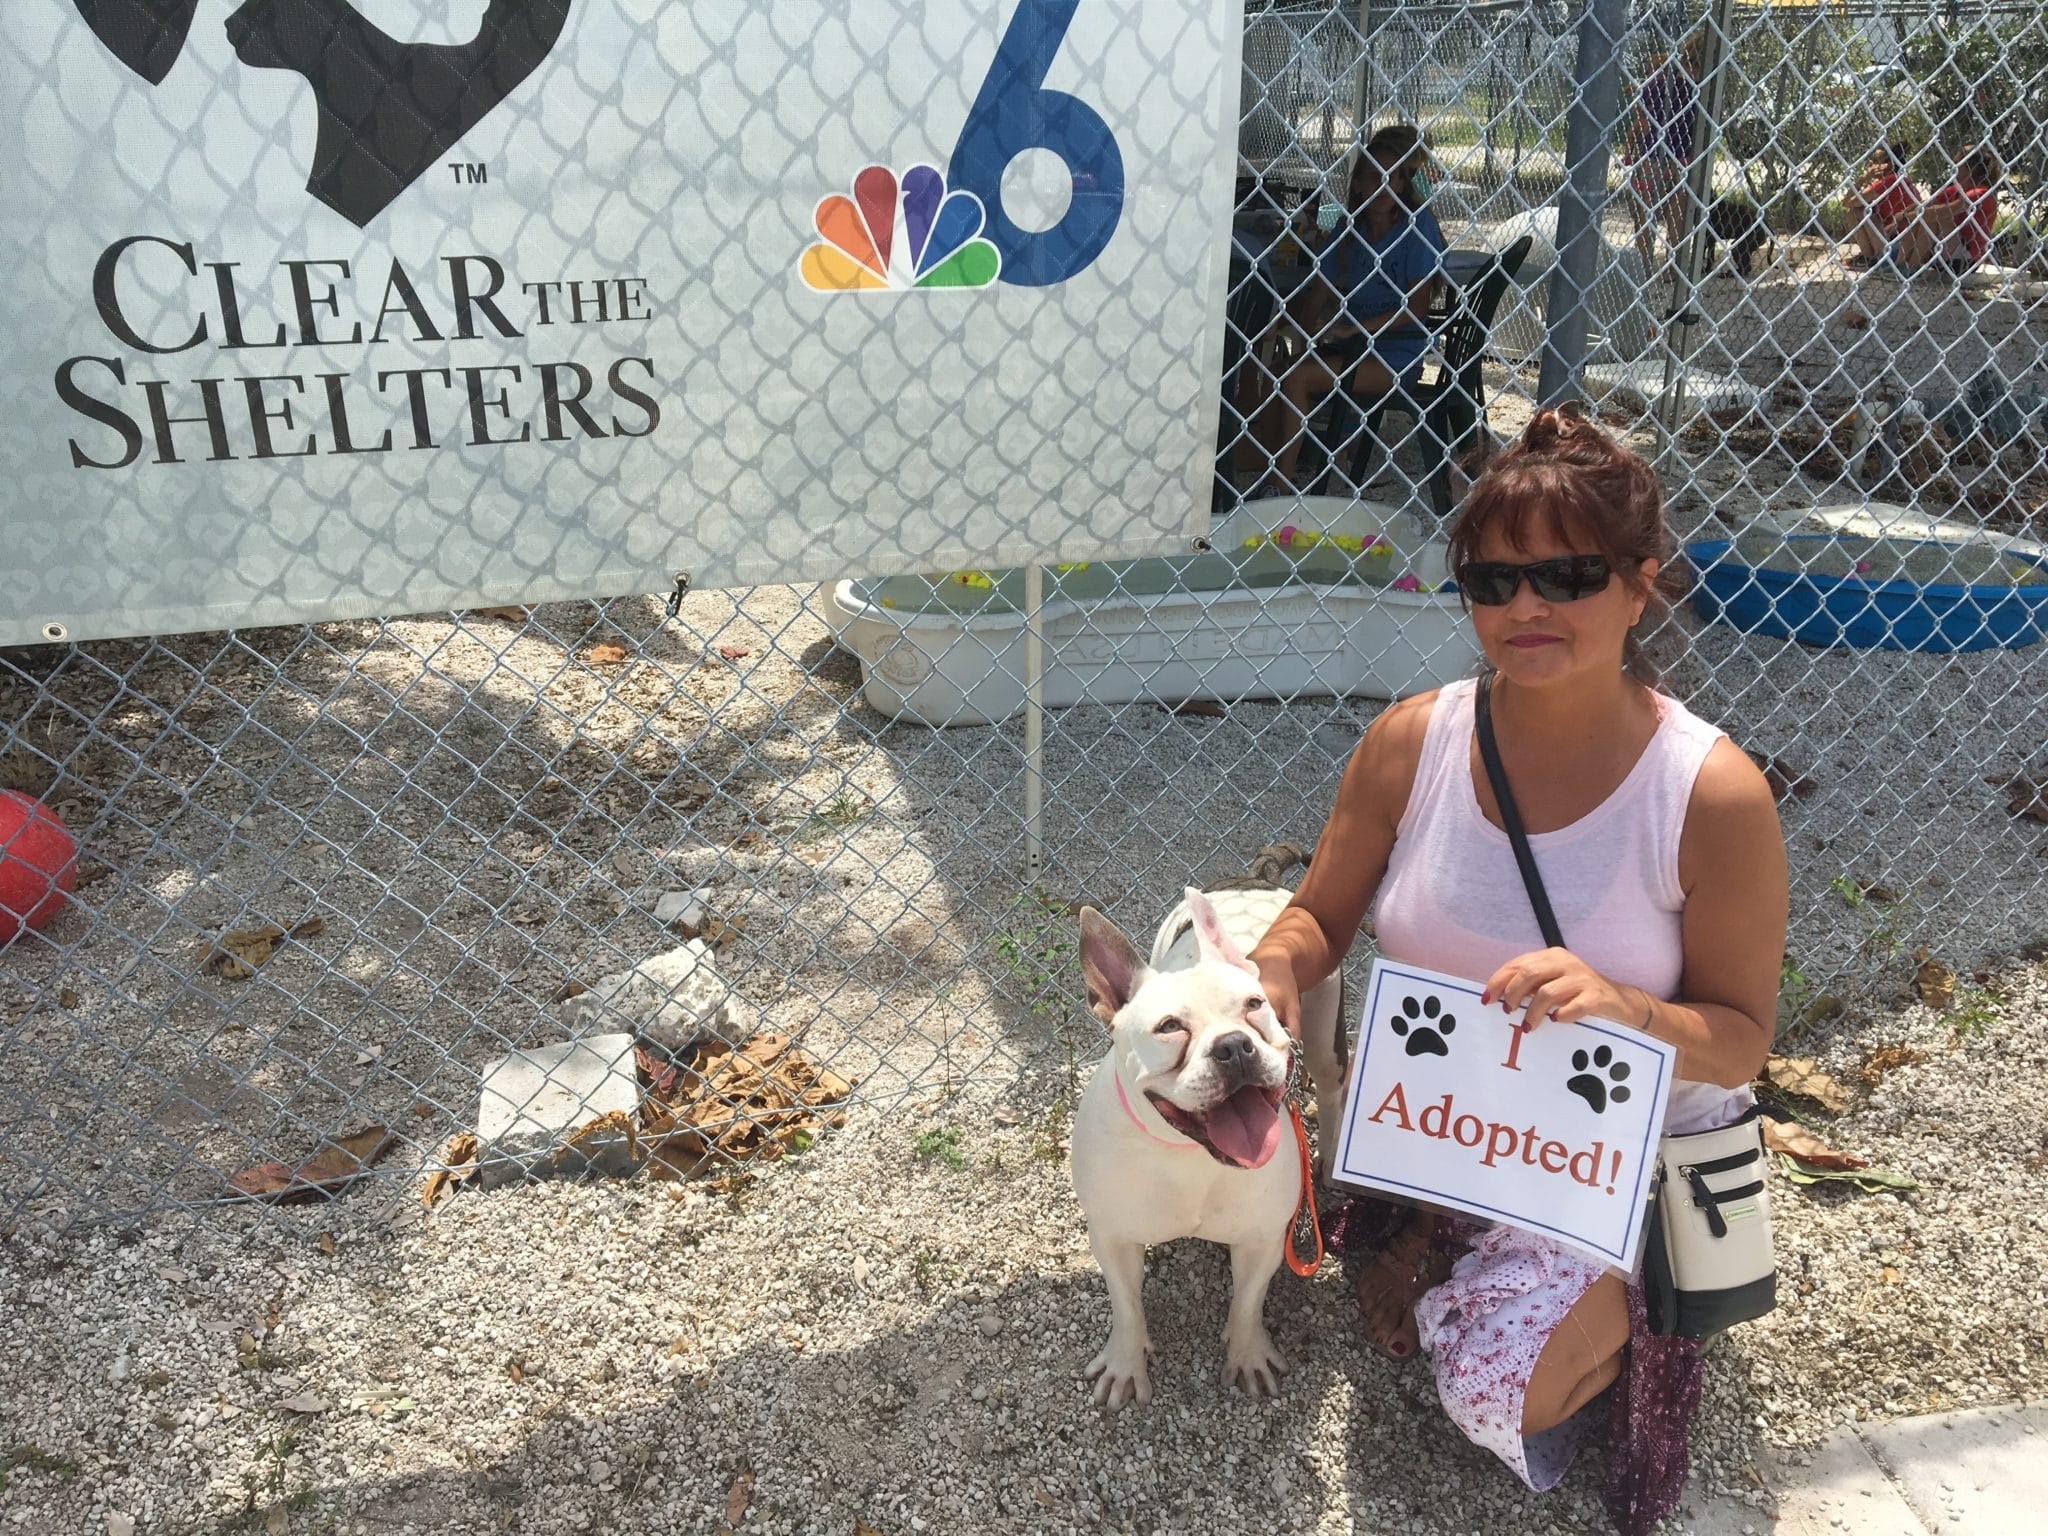 Florida Keys SPCA | Florida Keys SPCA, The Center for Animal Welfare